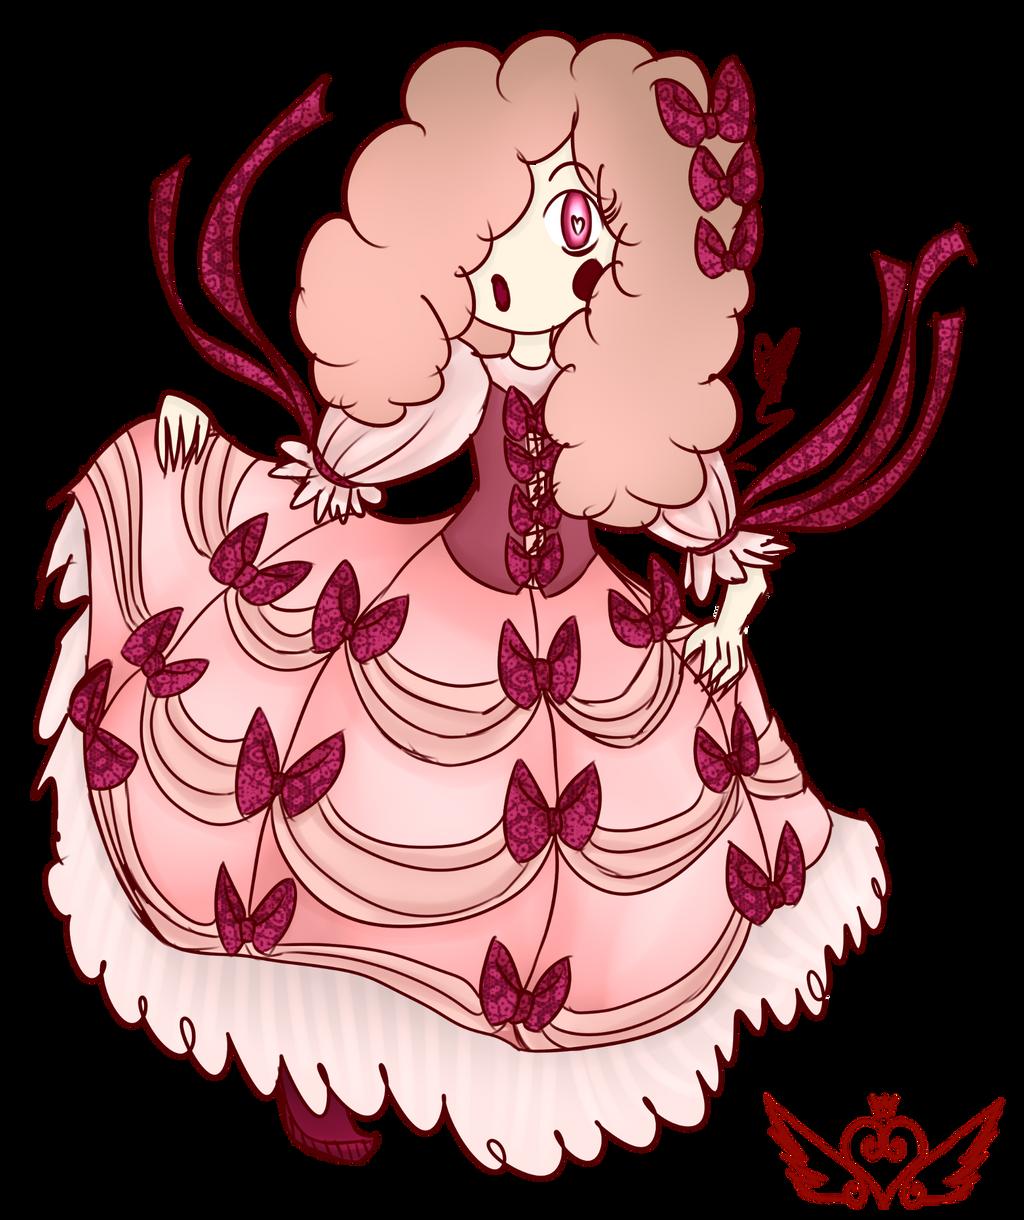 [Dollhouse] Color me Pink by OpalesquePrincess